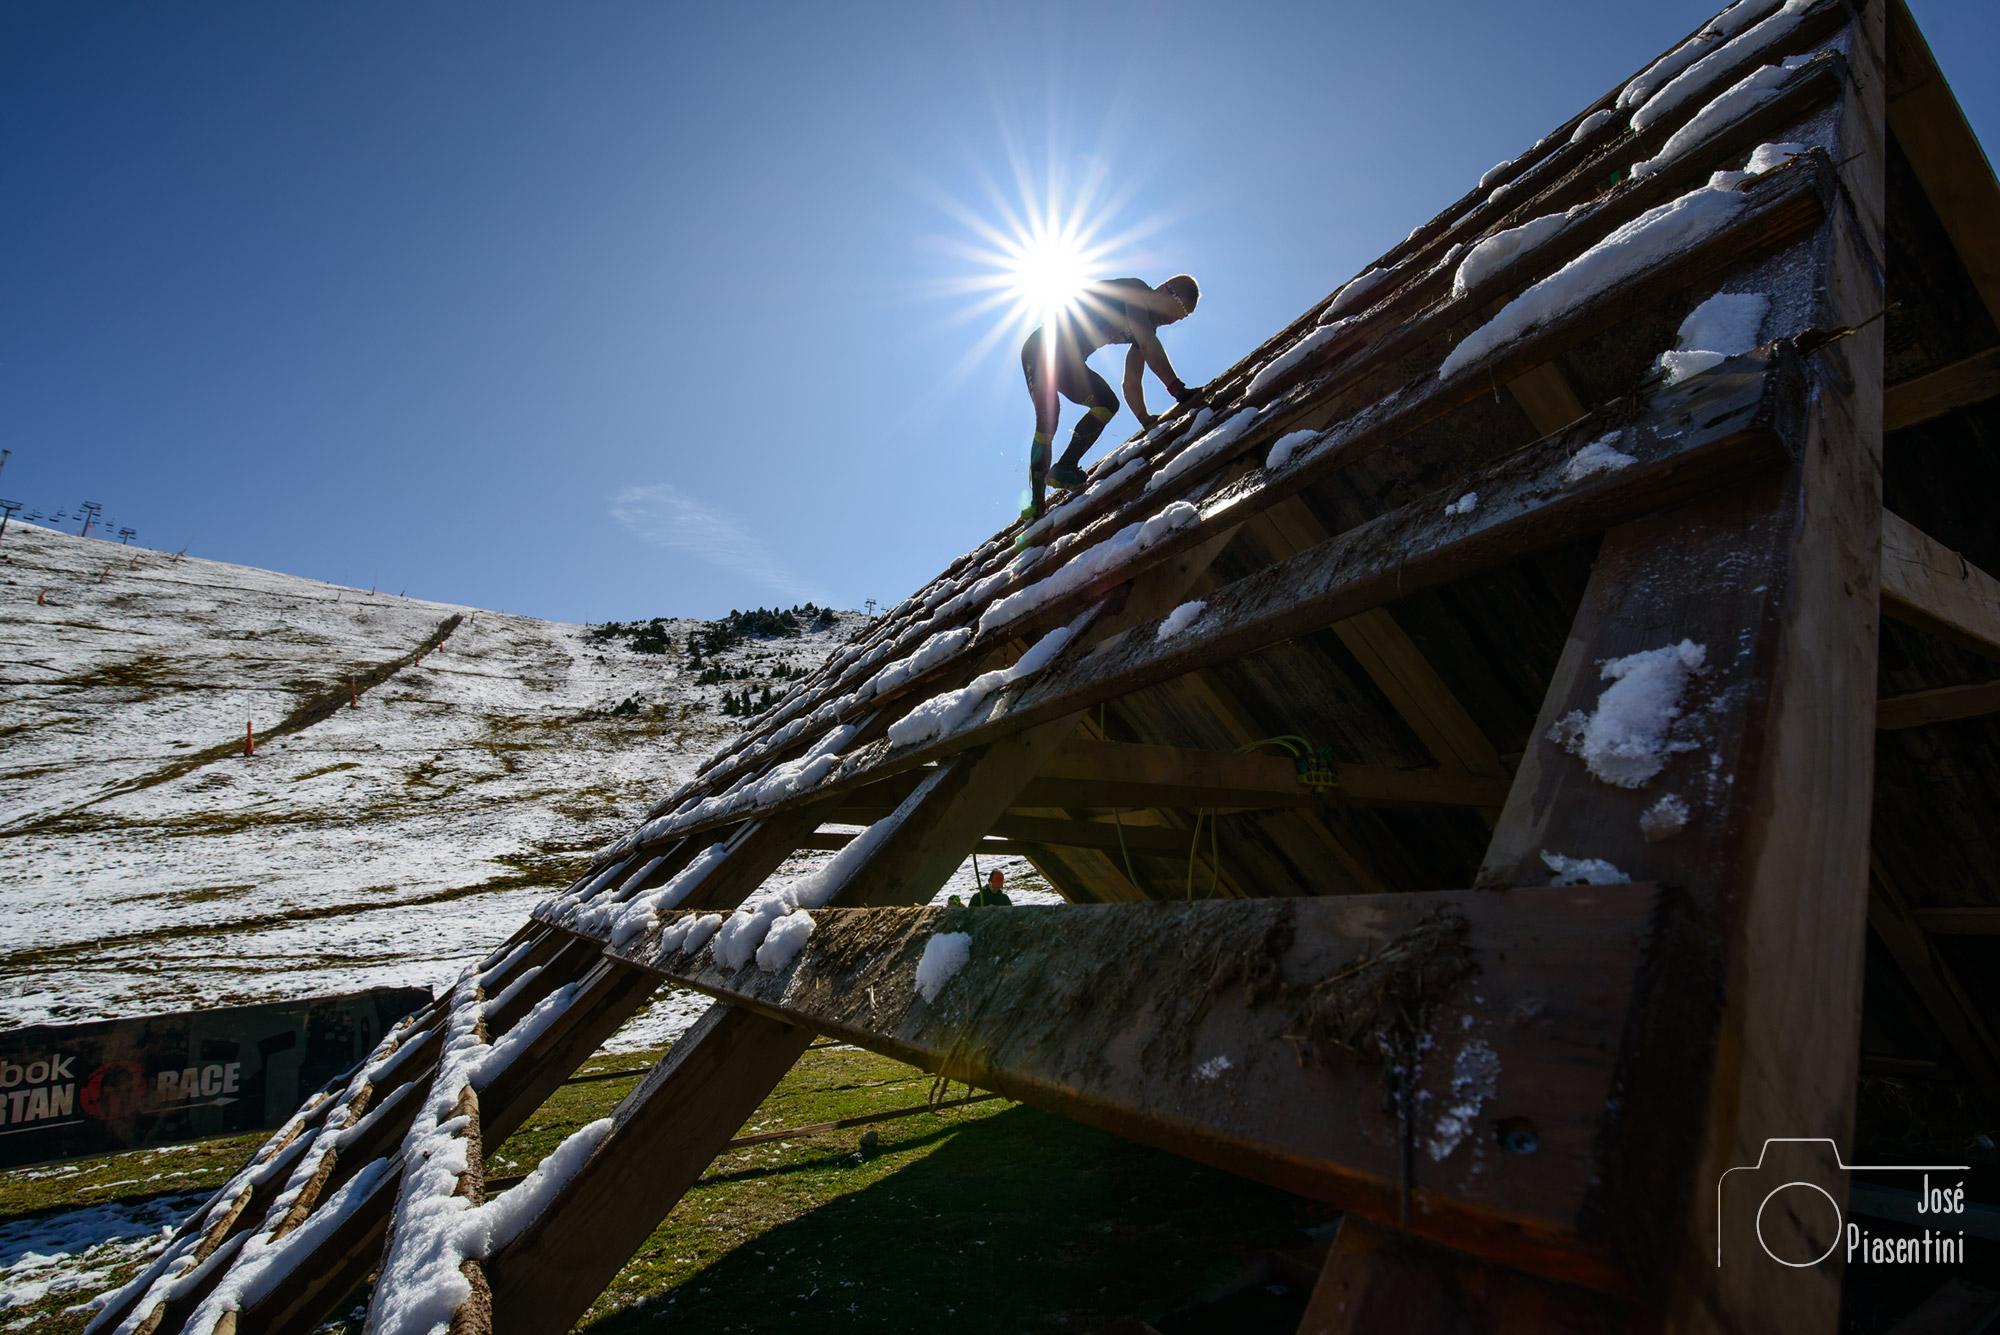 Reebok Spartan Race Encamp Andorra 2017